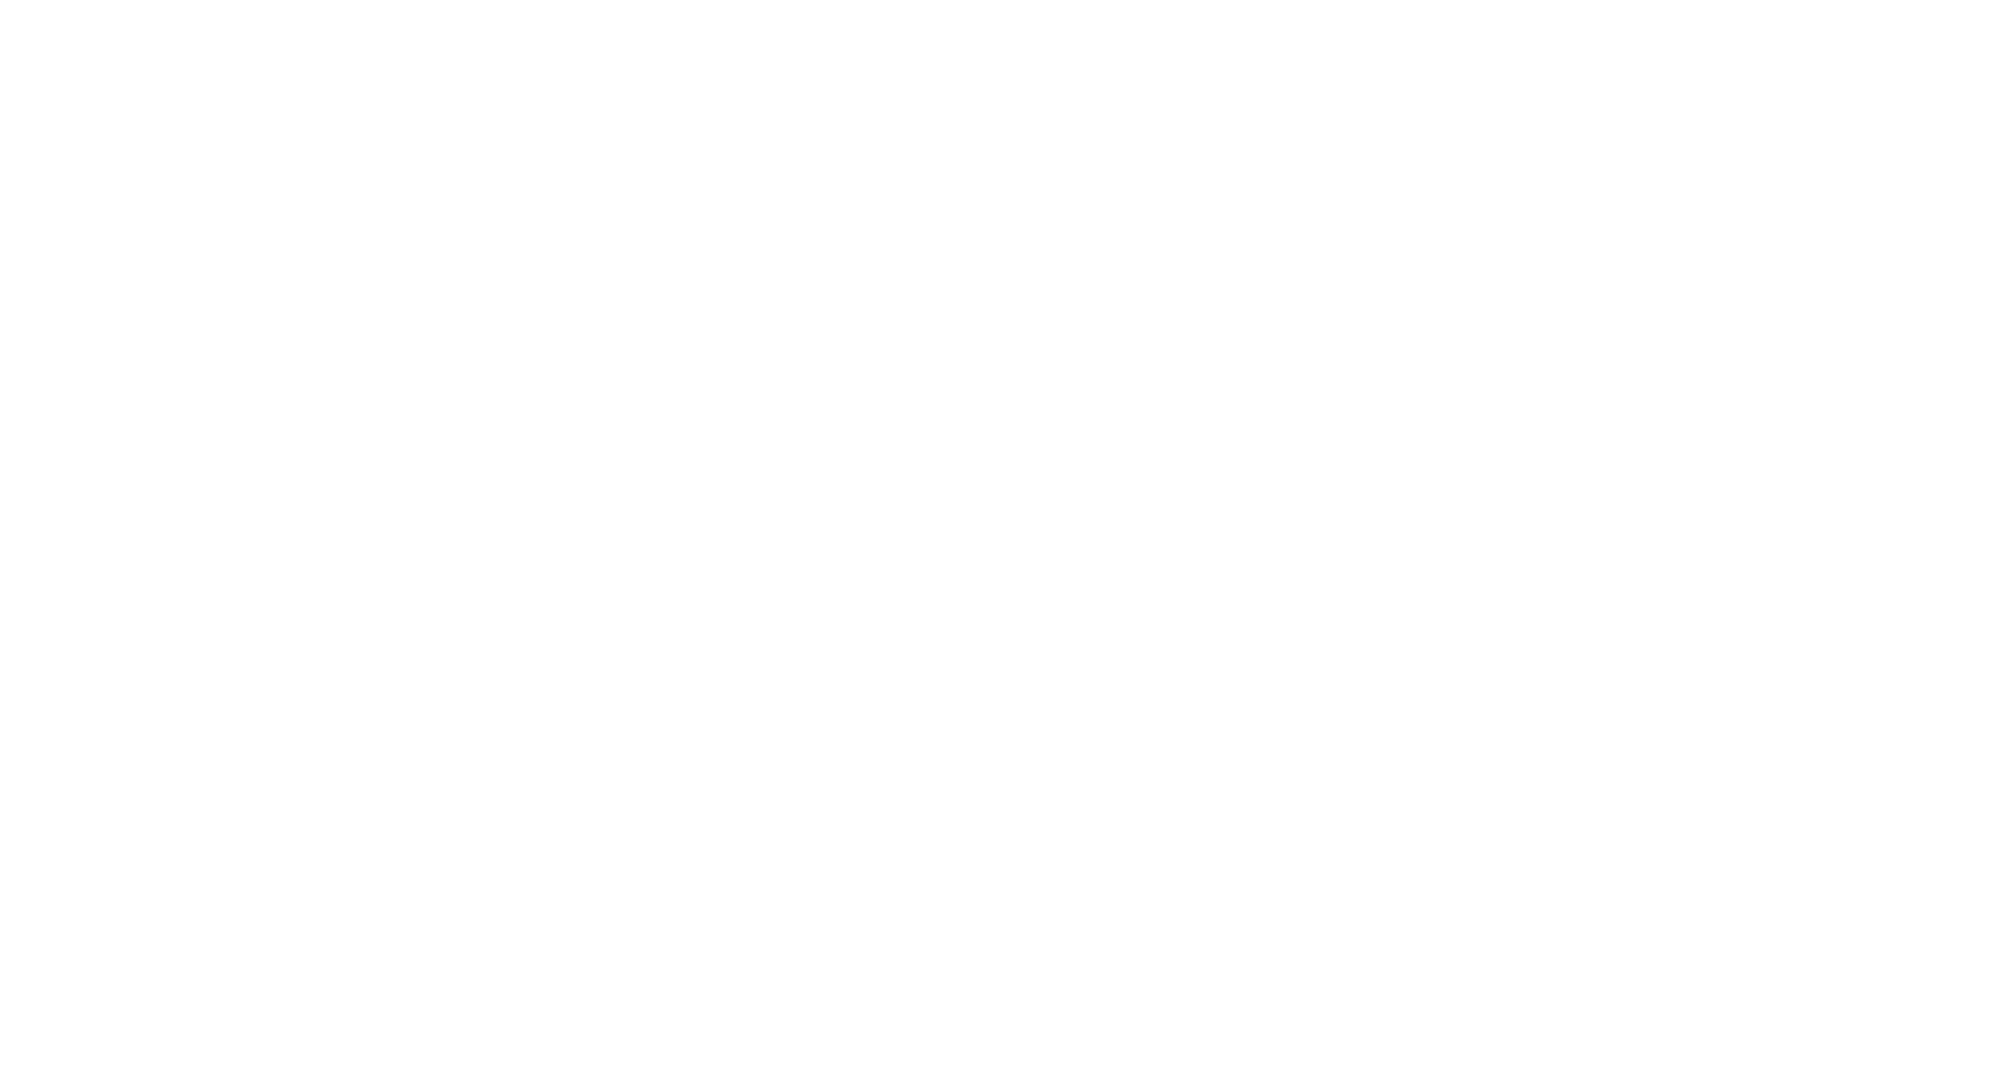 dvelop-logo-invers-4